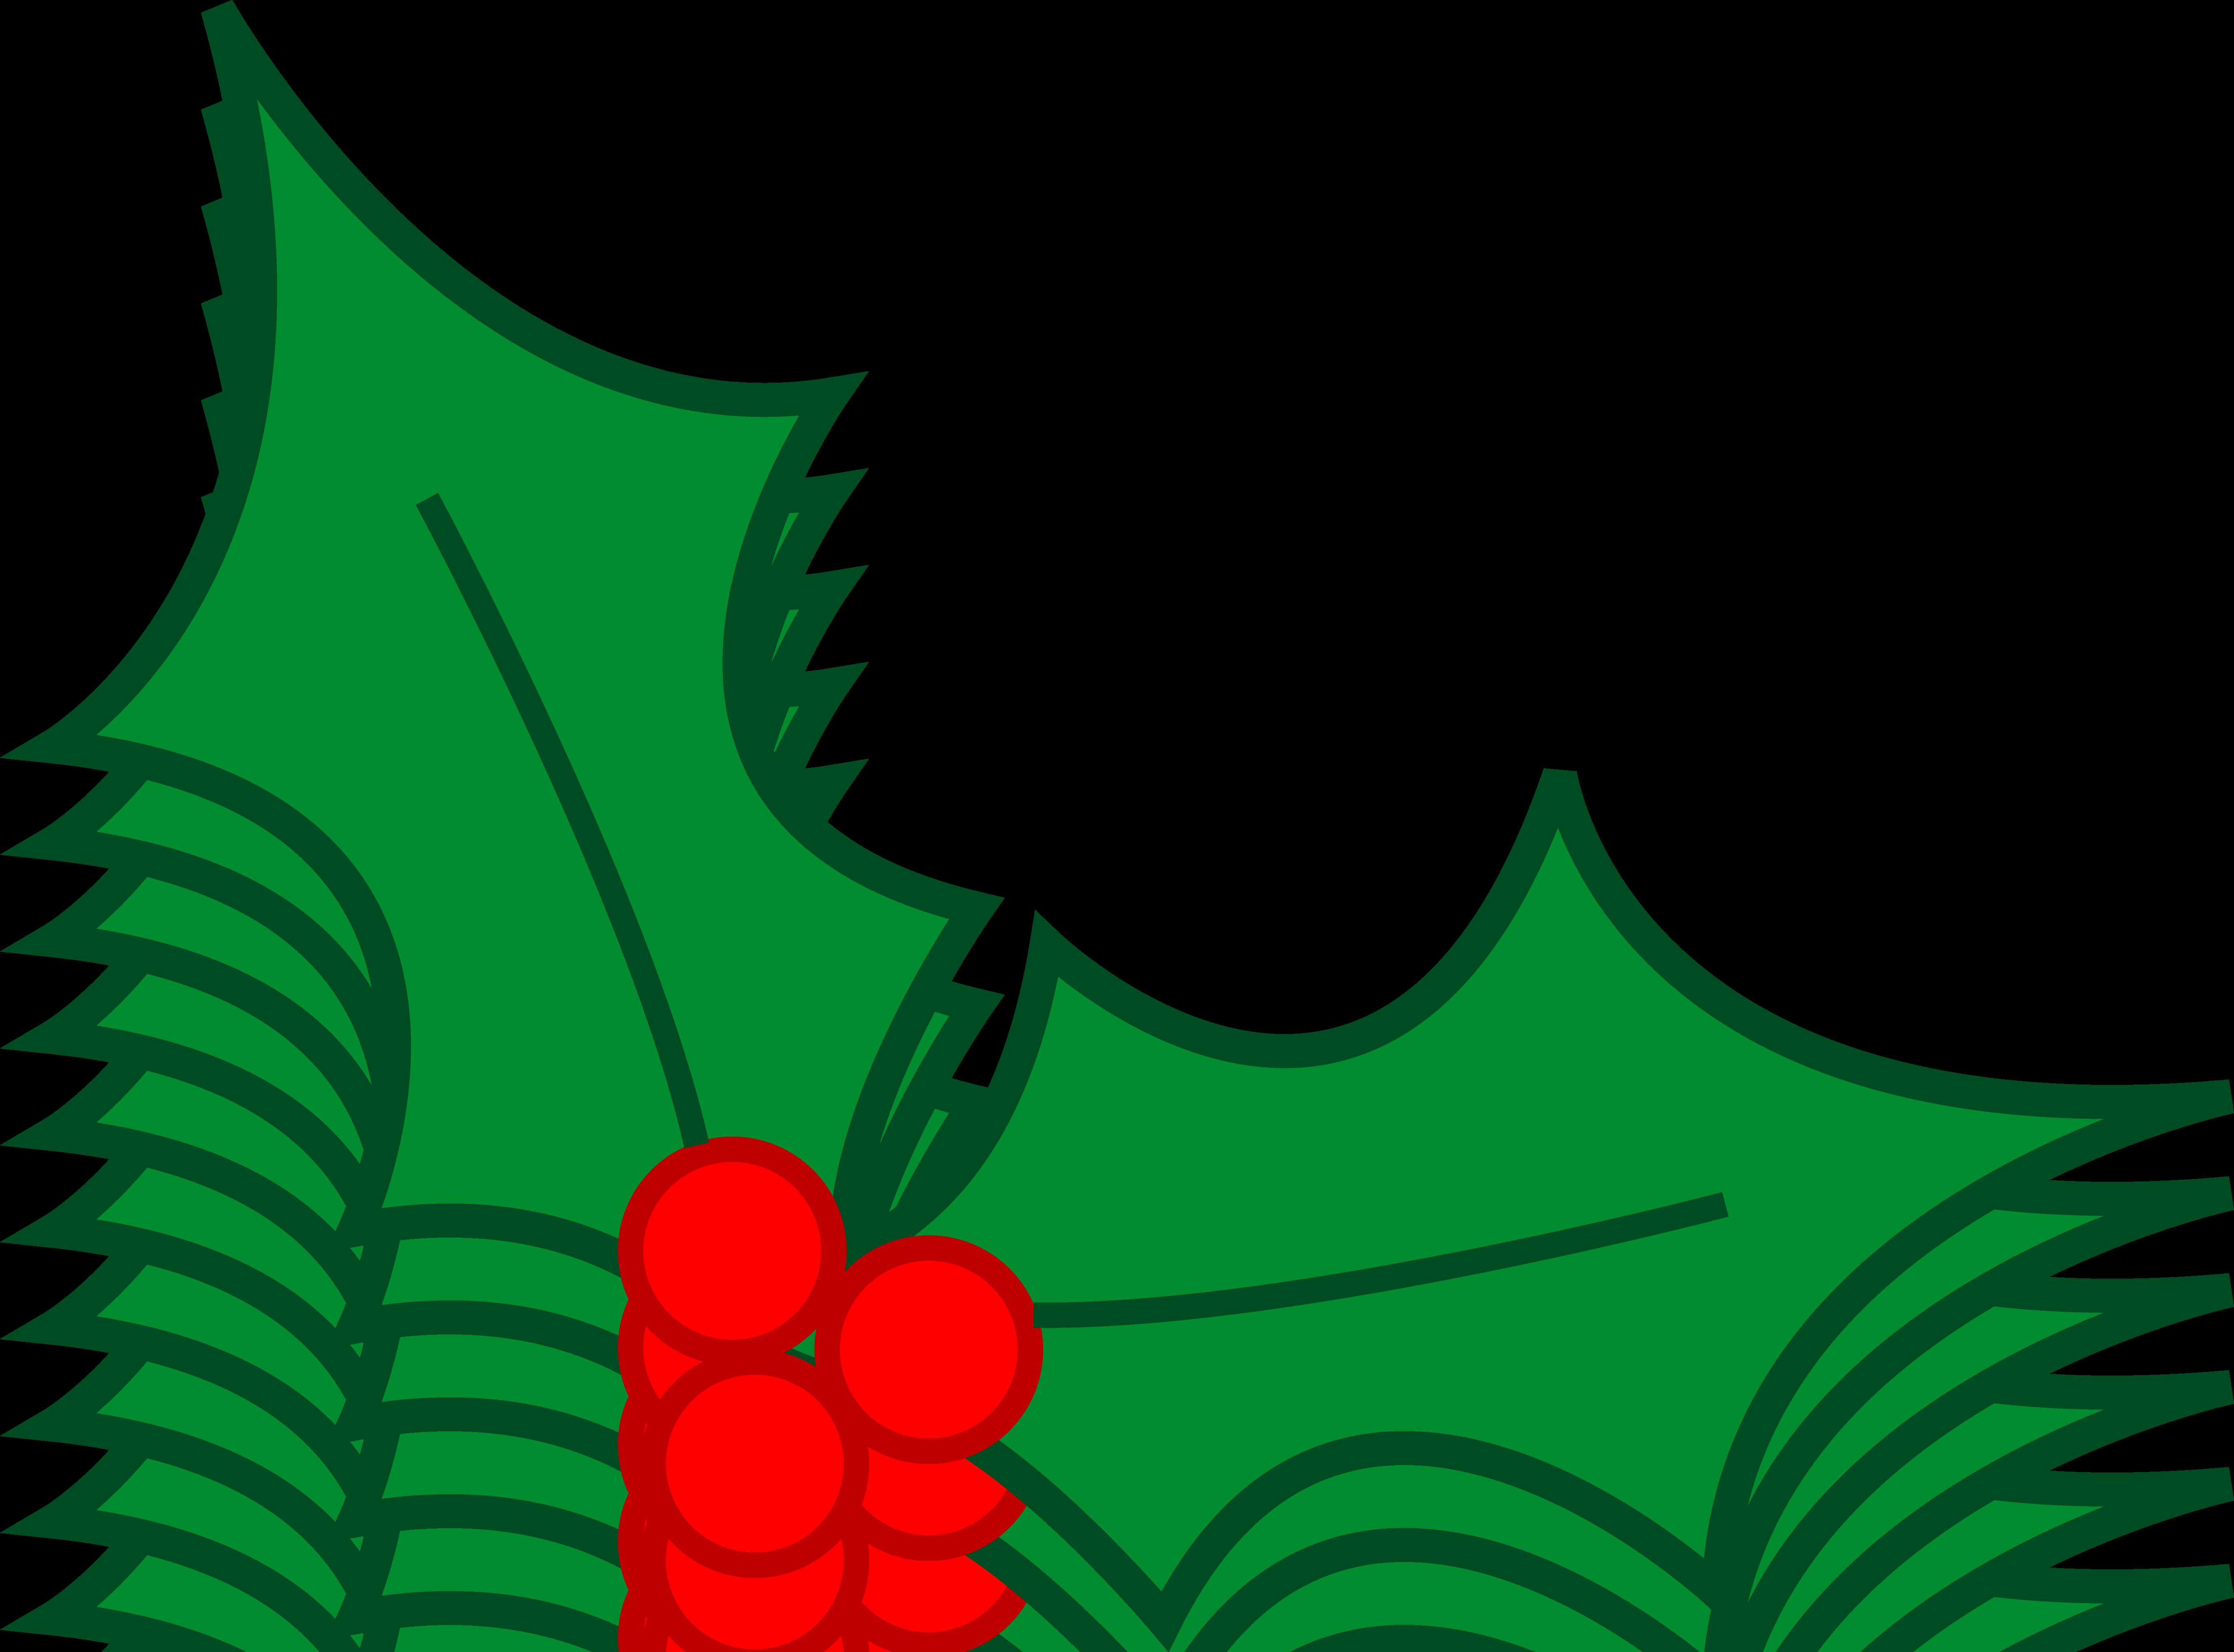 5487x4058 Christmas Graphics Clipart